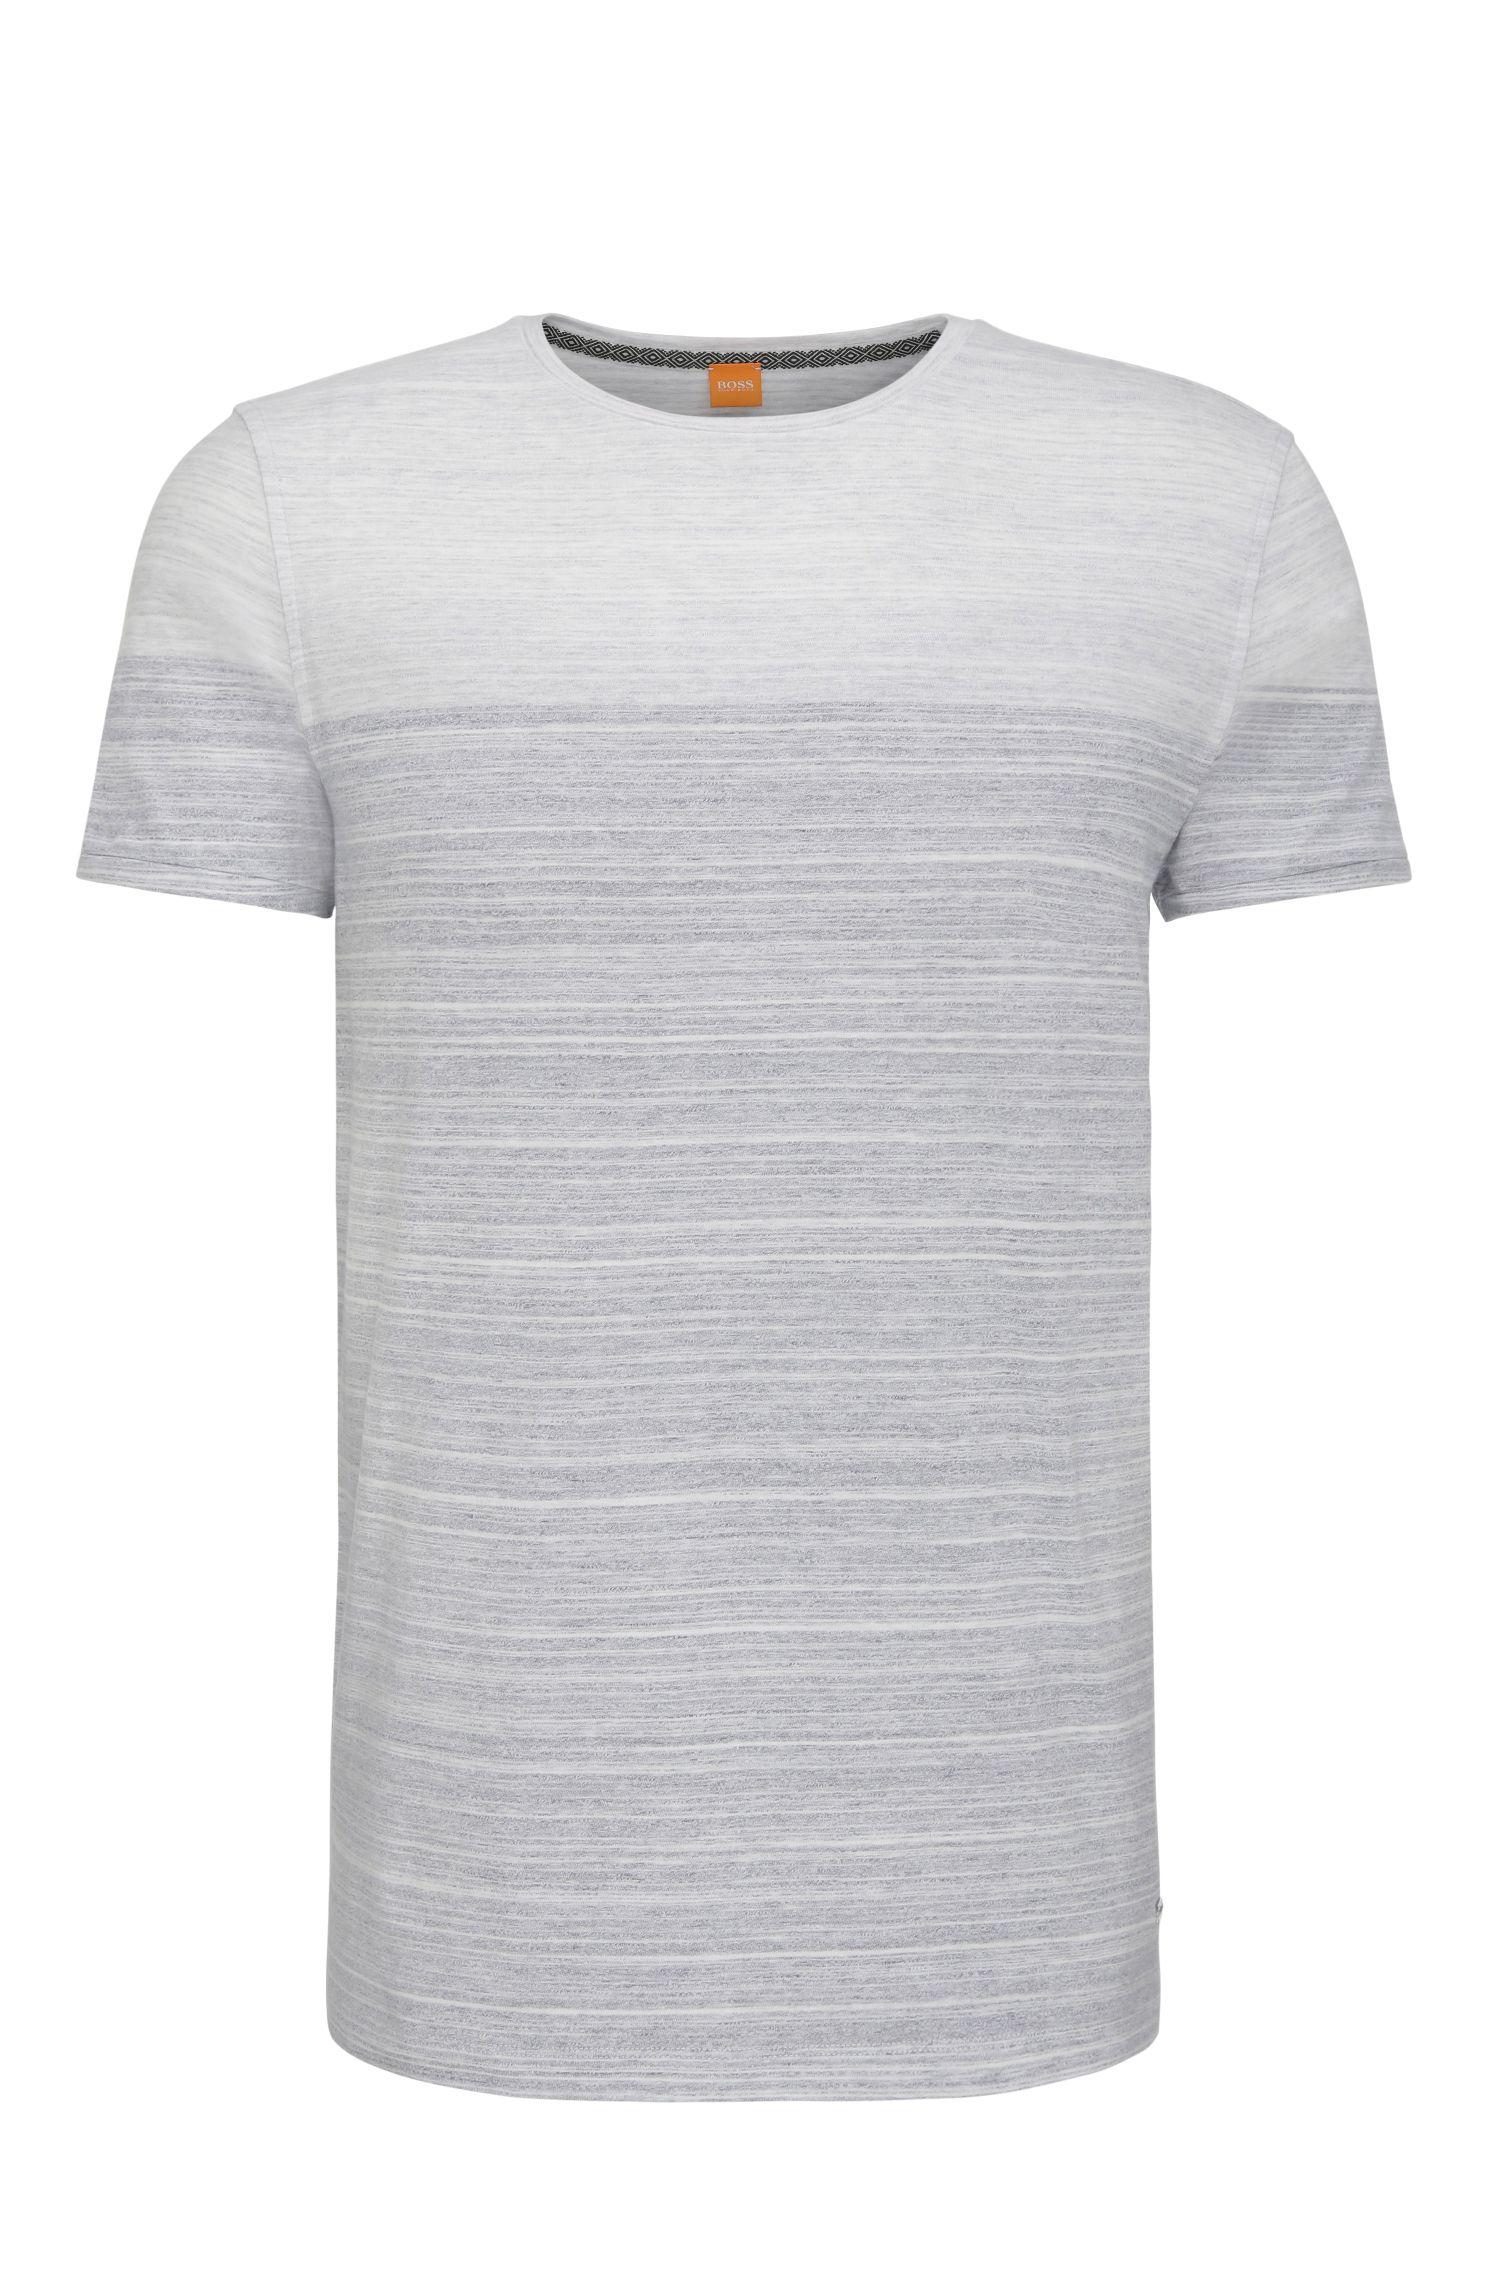 Relaxed-Fit T-Shirt aus Baumwolle im Colour-Block-Design: ´Trumble`